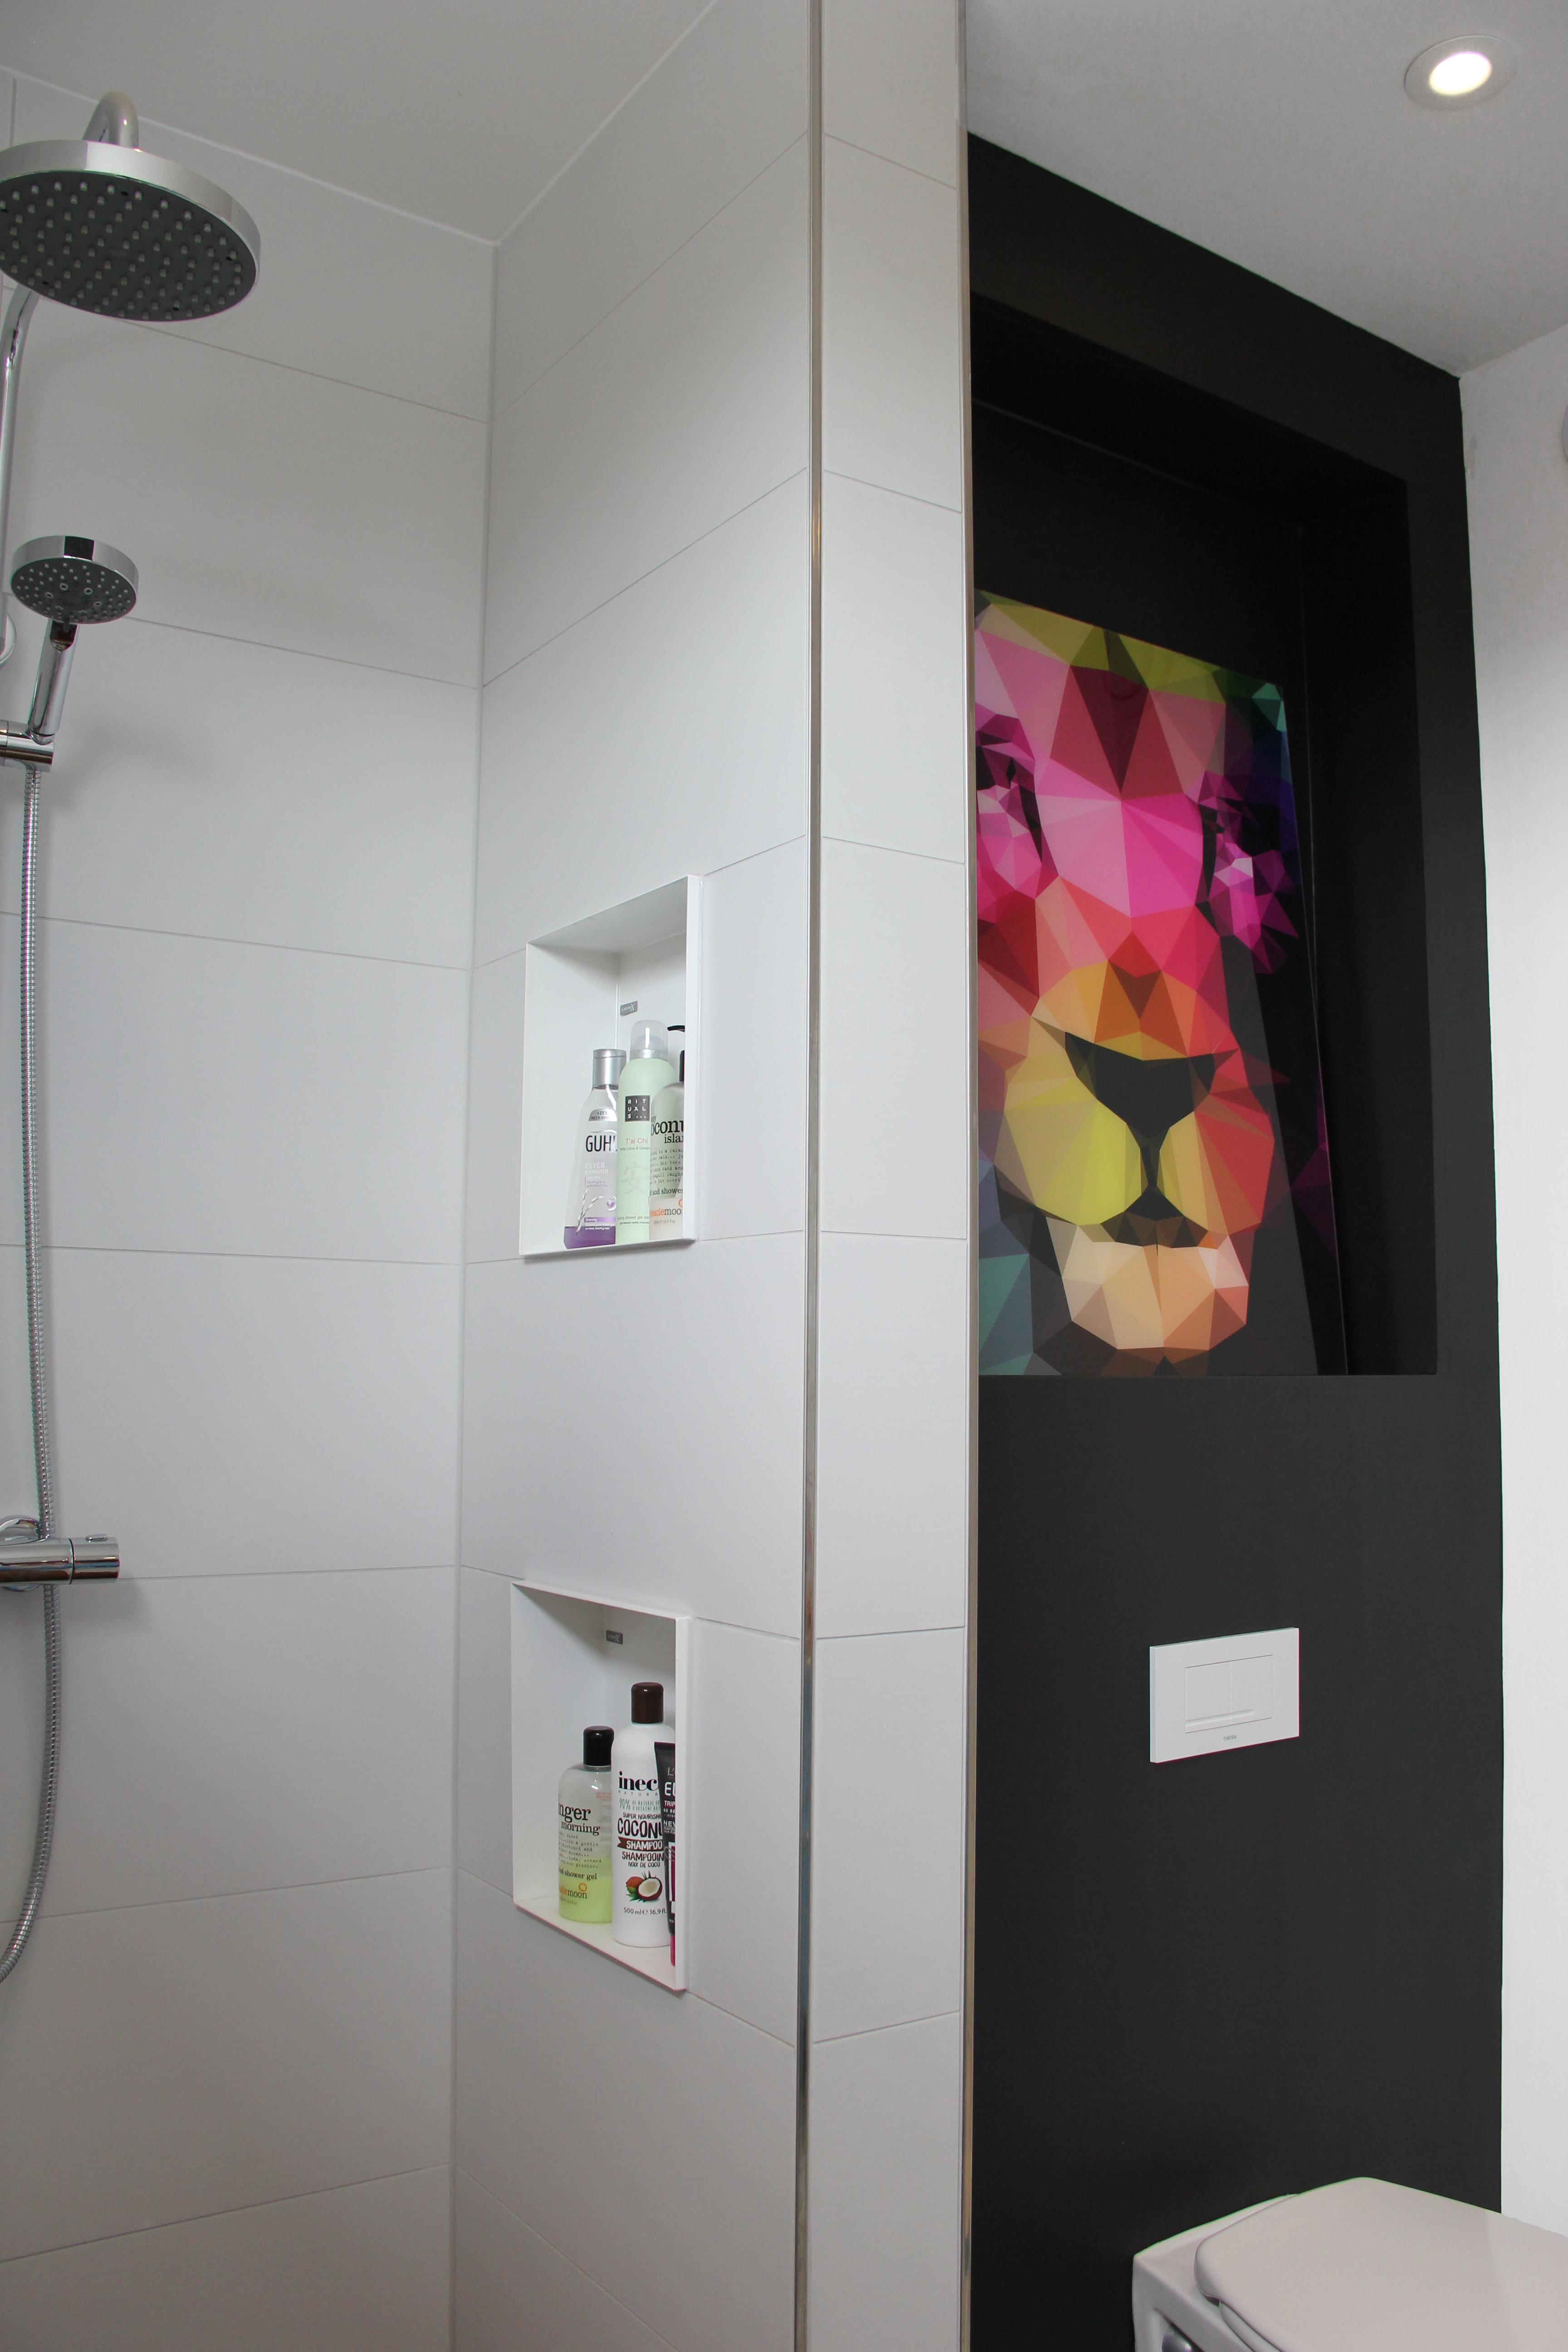 Nya interieurontwerp blog contrasten en kleur - Interieurontwerp thuis kleur ...